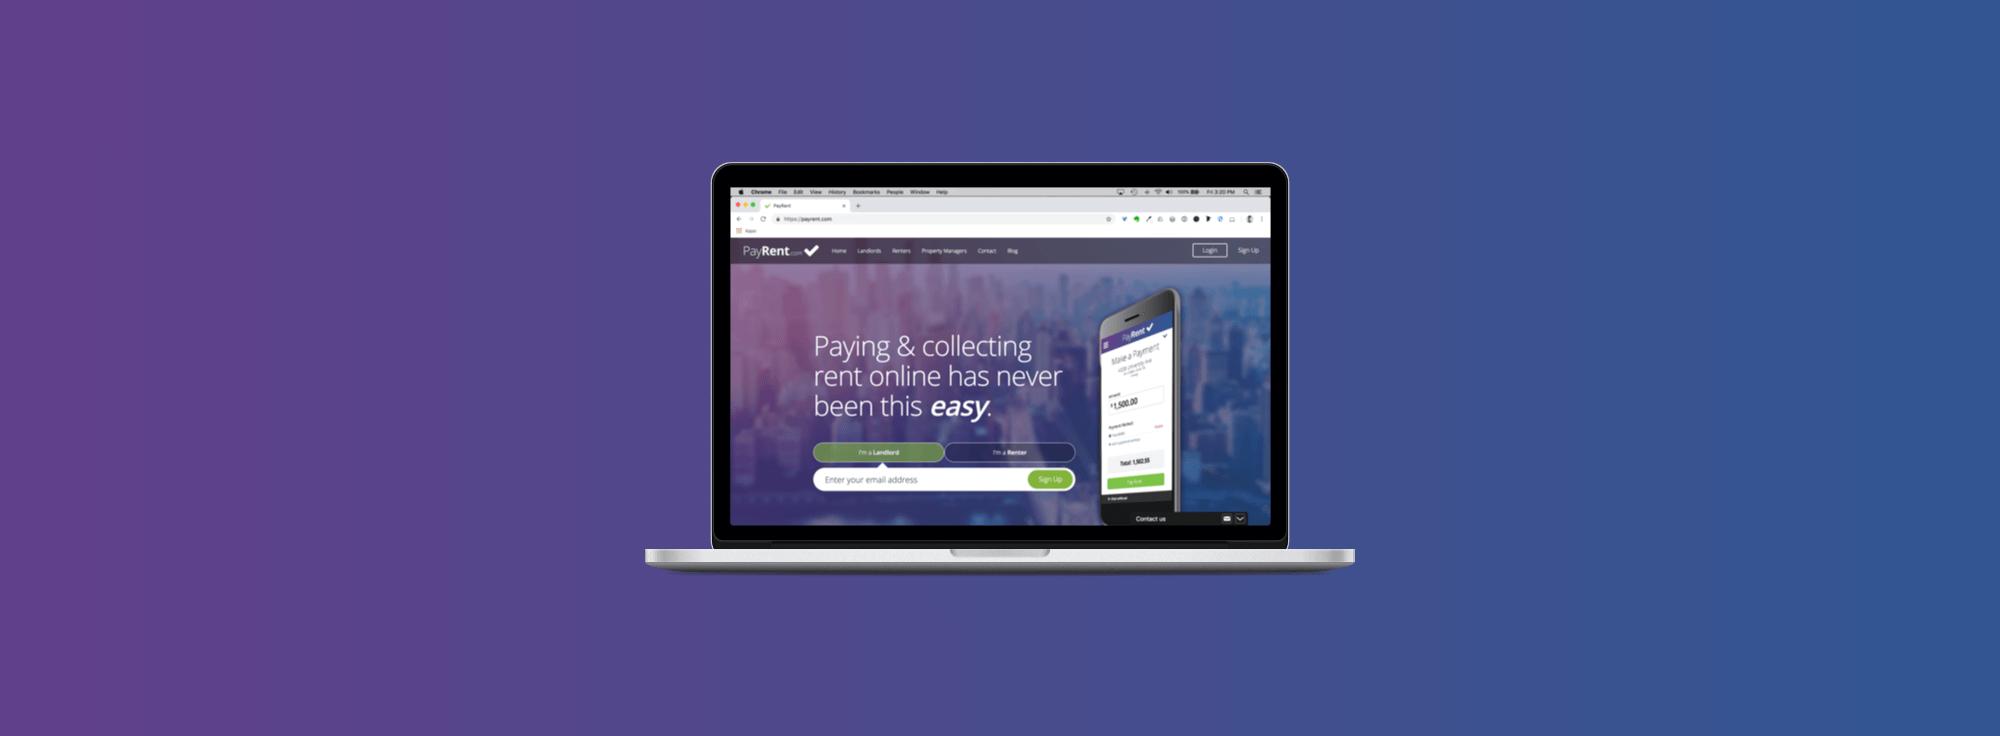 Paying Rent Online Through PayRent.com & Dwolla